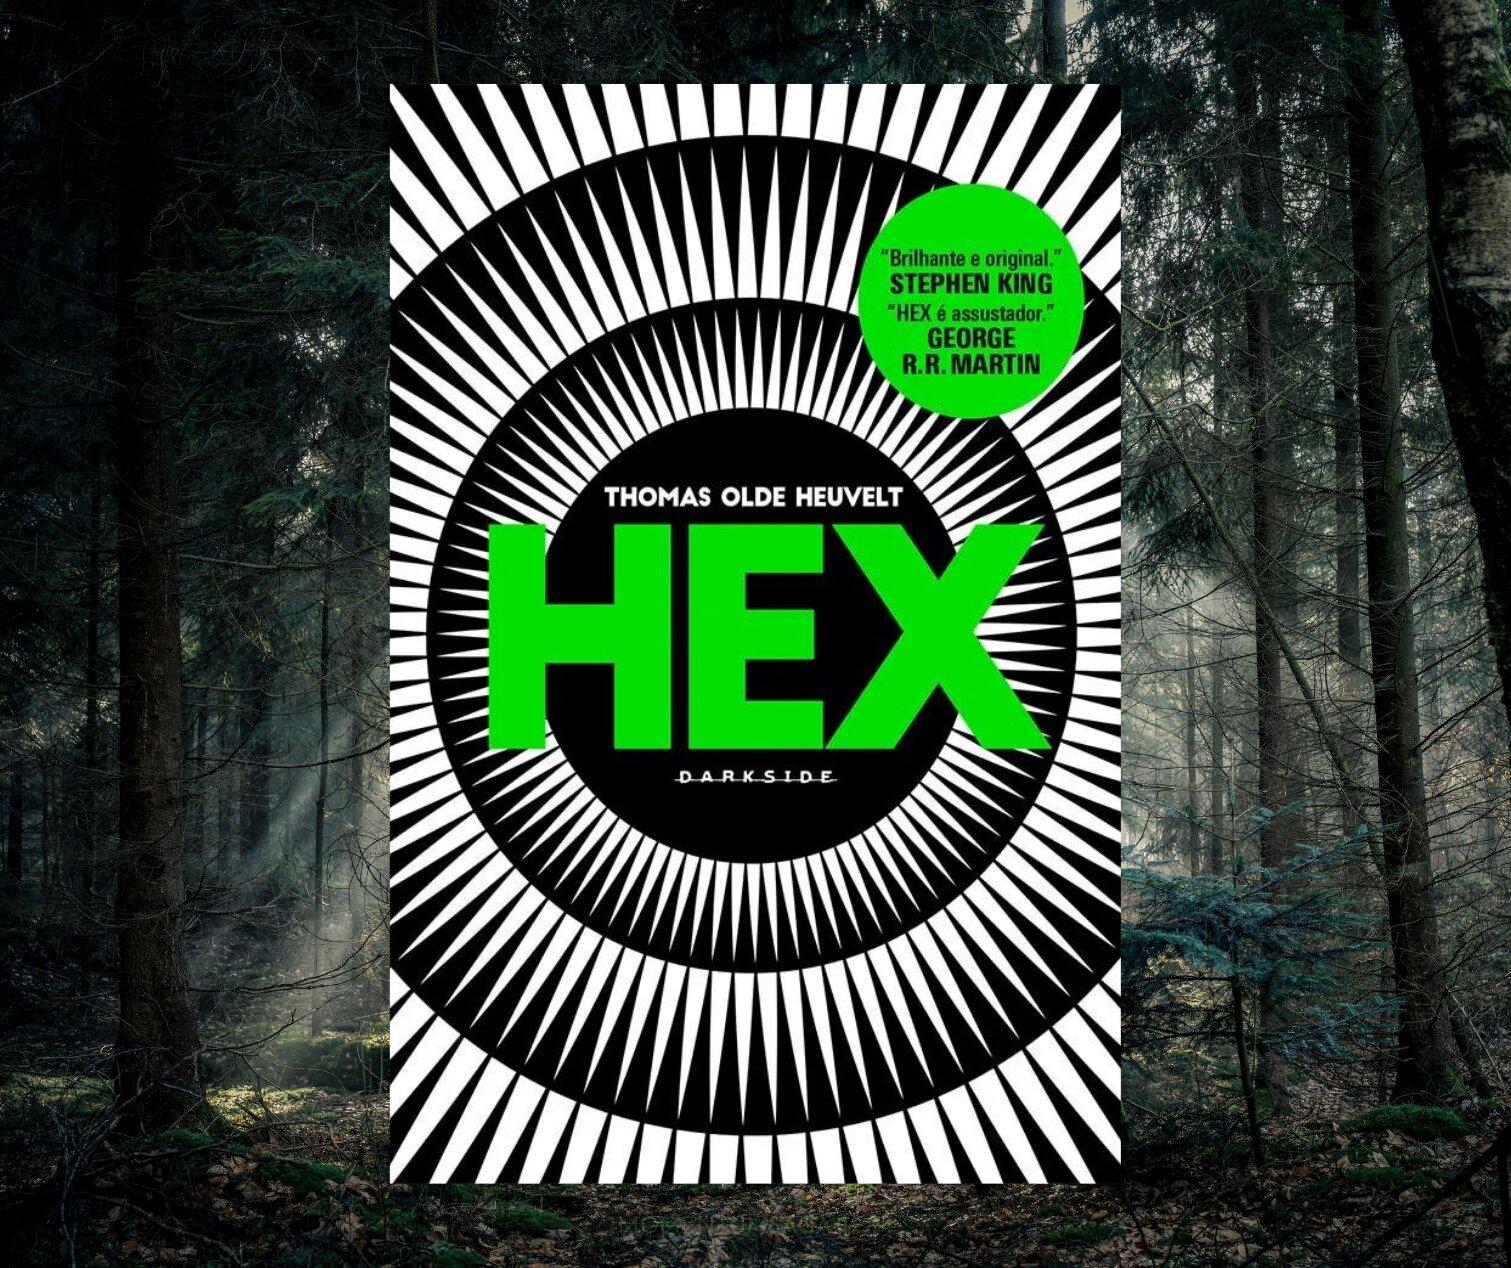 Resenha: HEX, de Thomas Olde Heuvelt